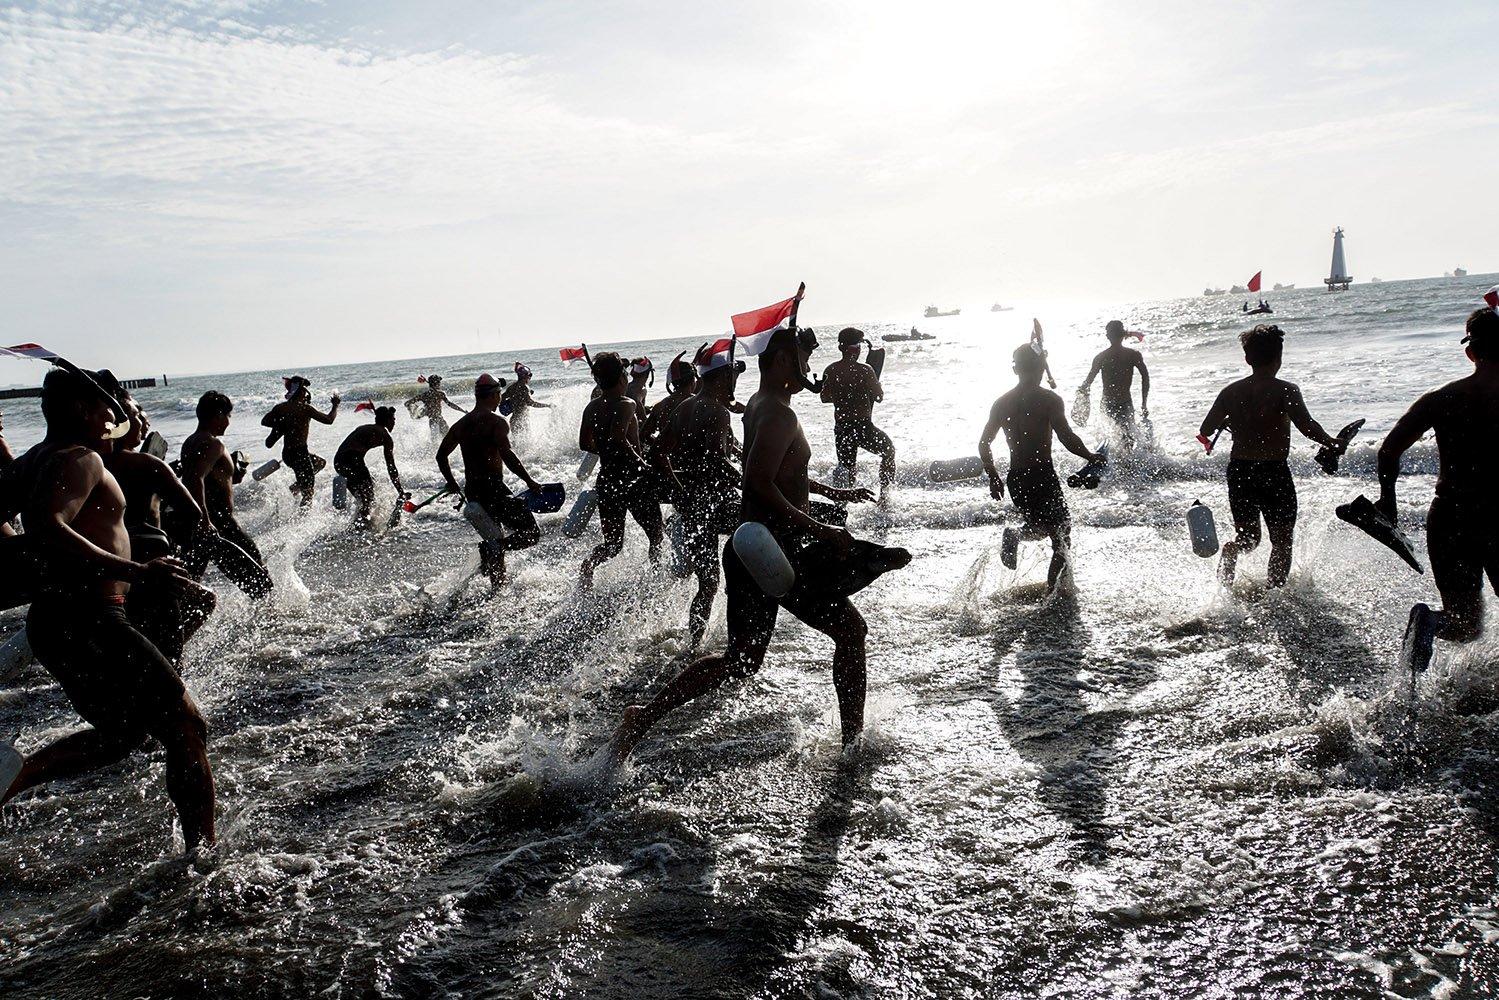 Anggota Detasemen Jala Mangkara (Denjaka), berlari menuju laut untuk melakukan renang sejauh 10km, saat perayaan HUT ke-72 RI, di Pantai Teluk Penyu, Cilacap, Jawa Tengah, Kamis (17/8). Sebanyak 75 anggota Detasemen Jala Mangkara (Denjaka) yang merupakan detasemen pasukan khusus TNI Angkatan Laut, merayakan hari kemerdekaan dengan berenang sejauh 10km, dan melakukan upacara bersama nelayan disertai dengan pengibaran bendera merah putih di mercusuar.